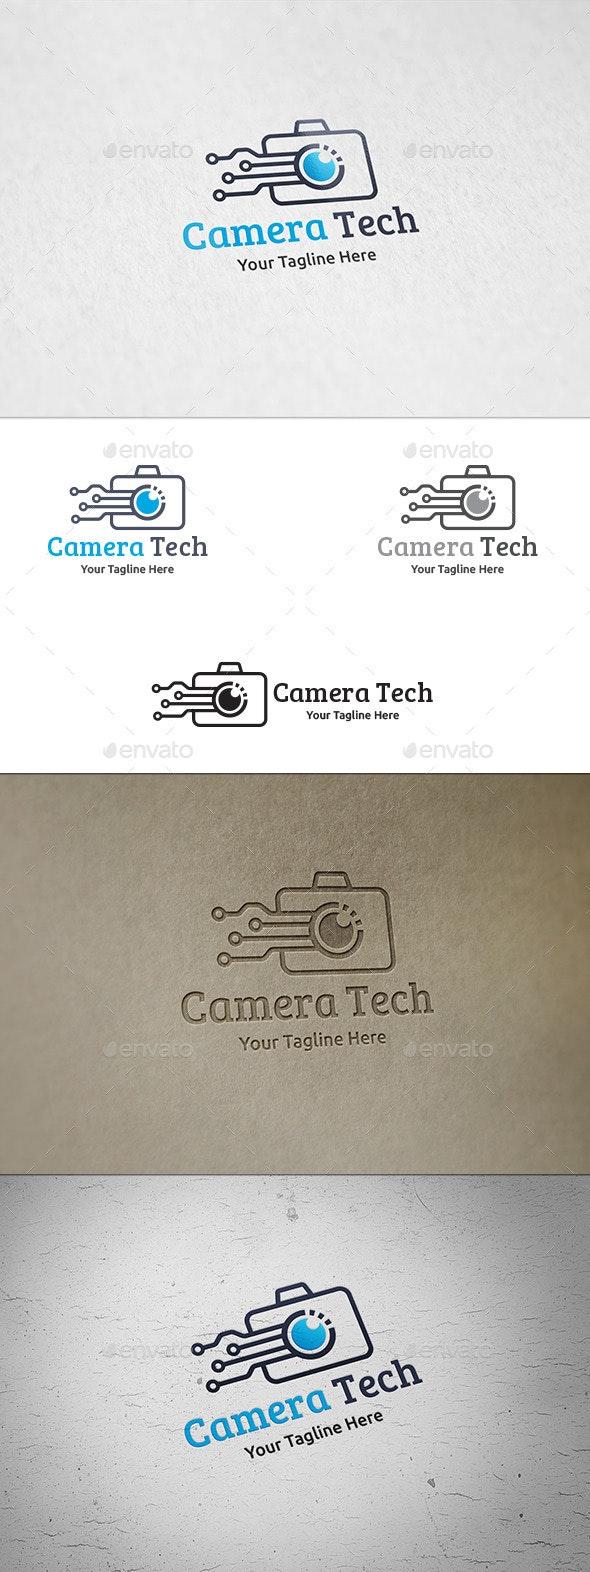 Camera Tech - Logo Template - Objects Logo Templates